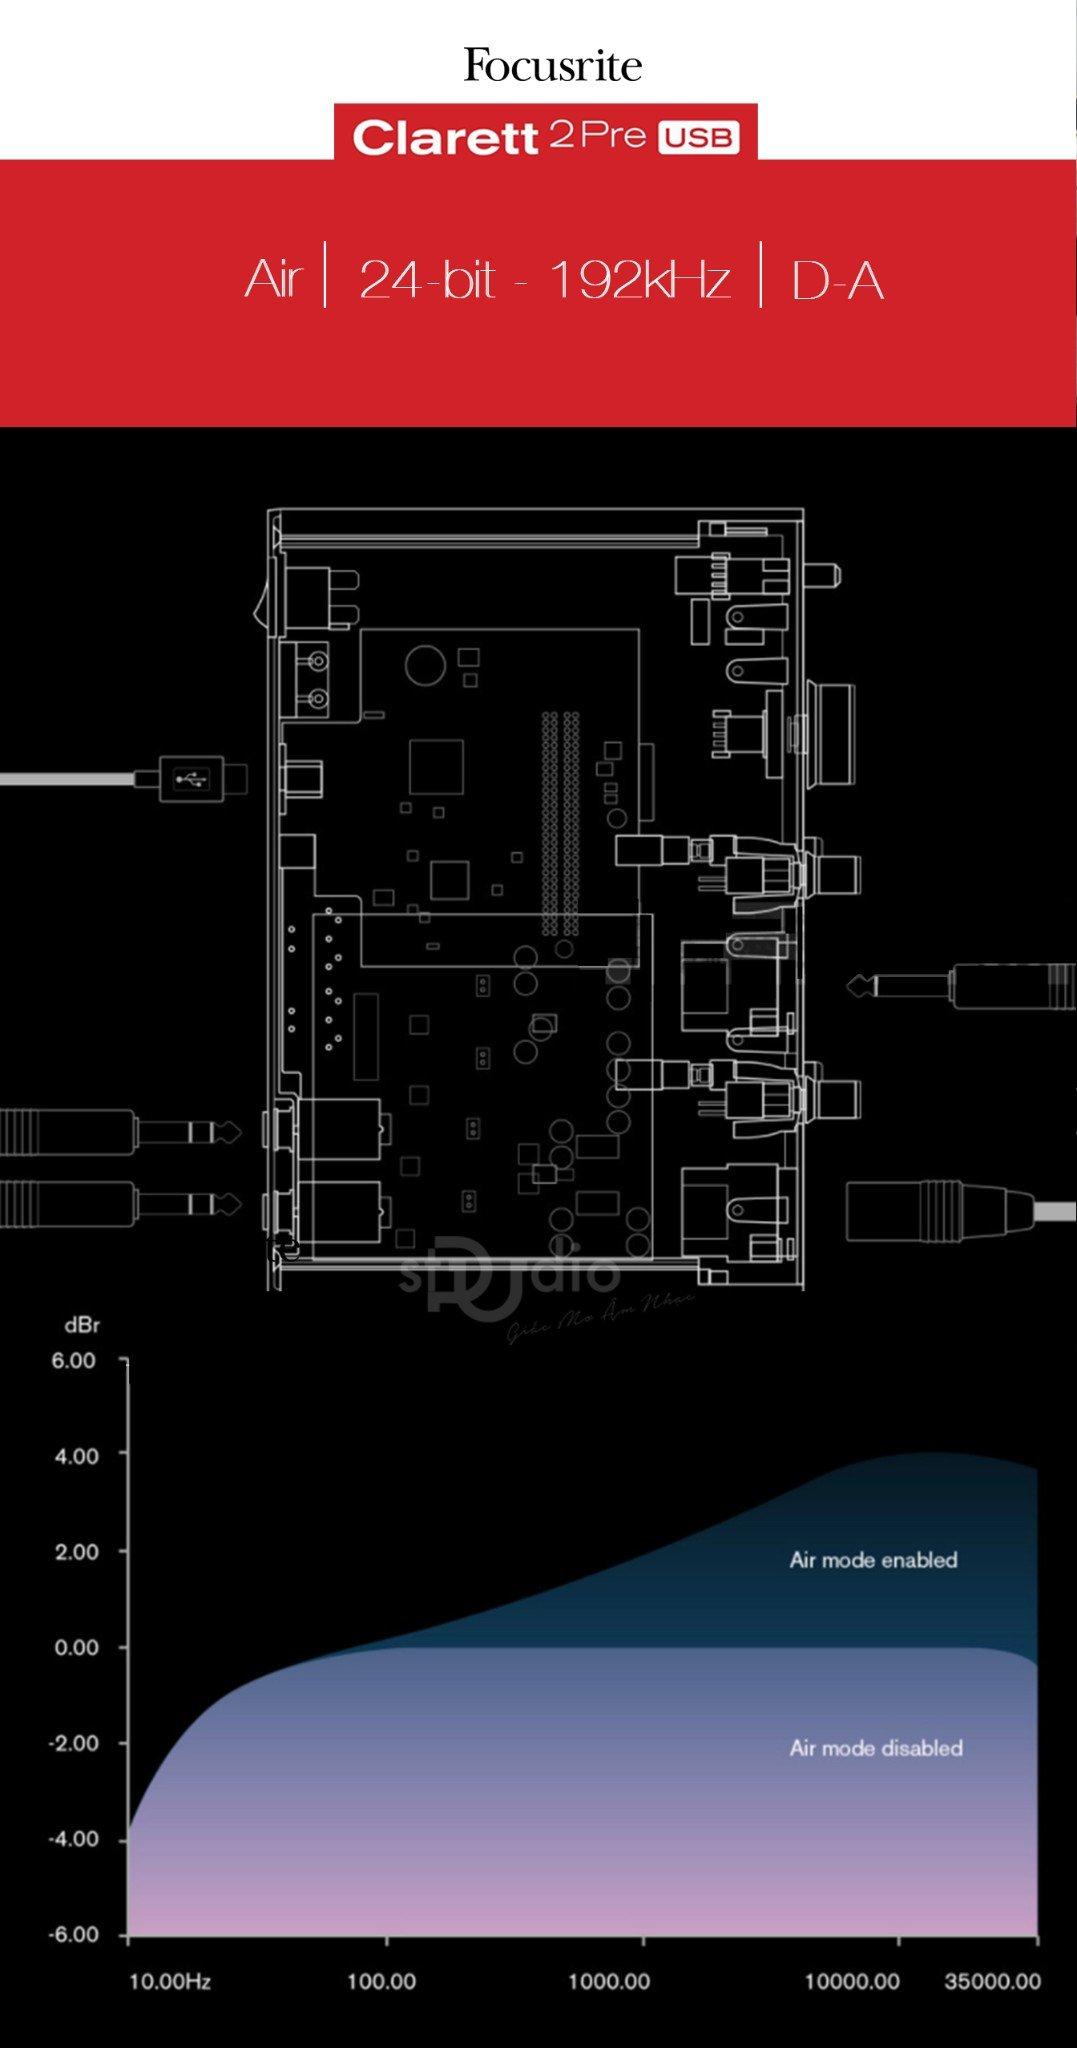 Soundcard Focusrite Scarlett 2Pre USB - Interface thu âm cao cấp